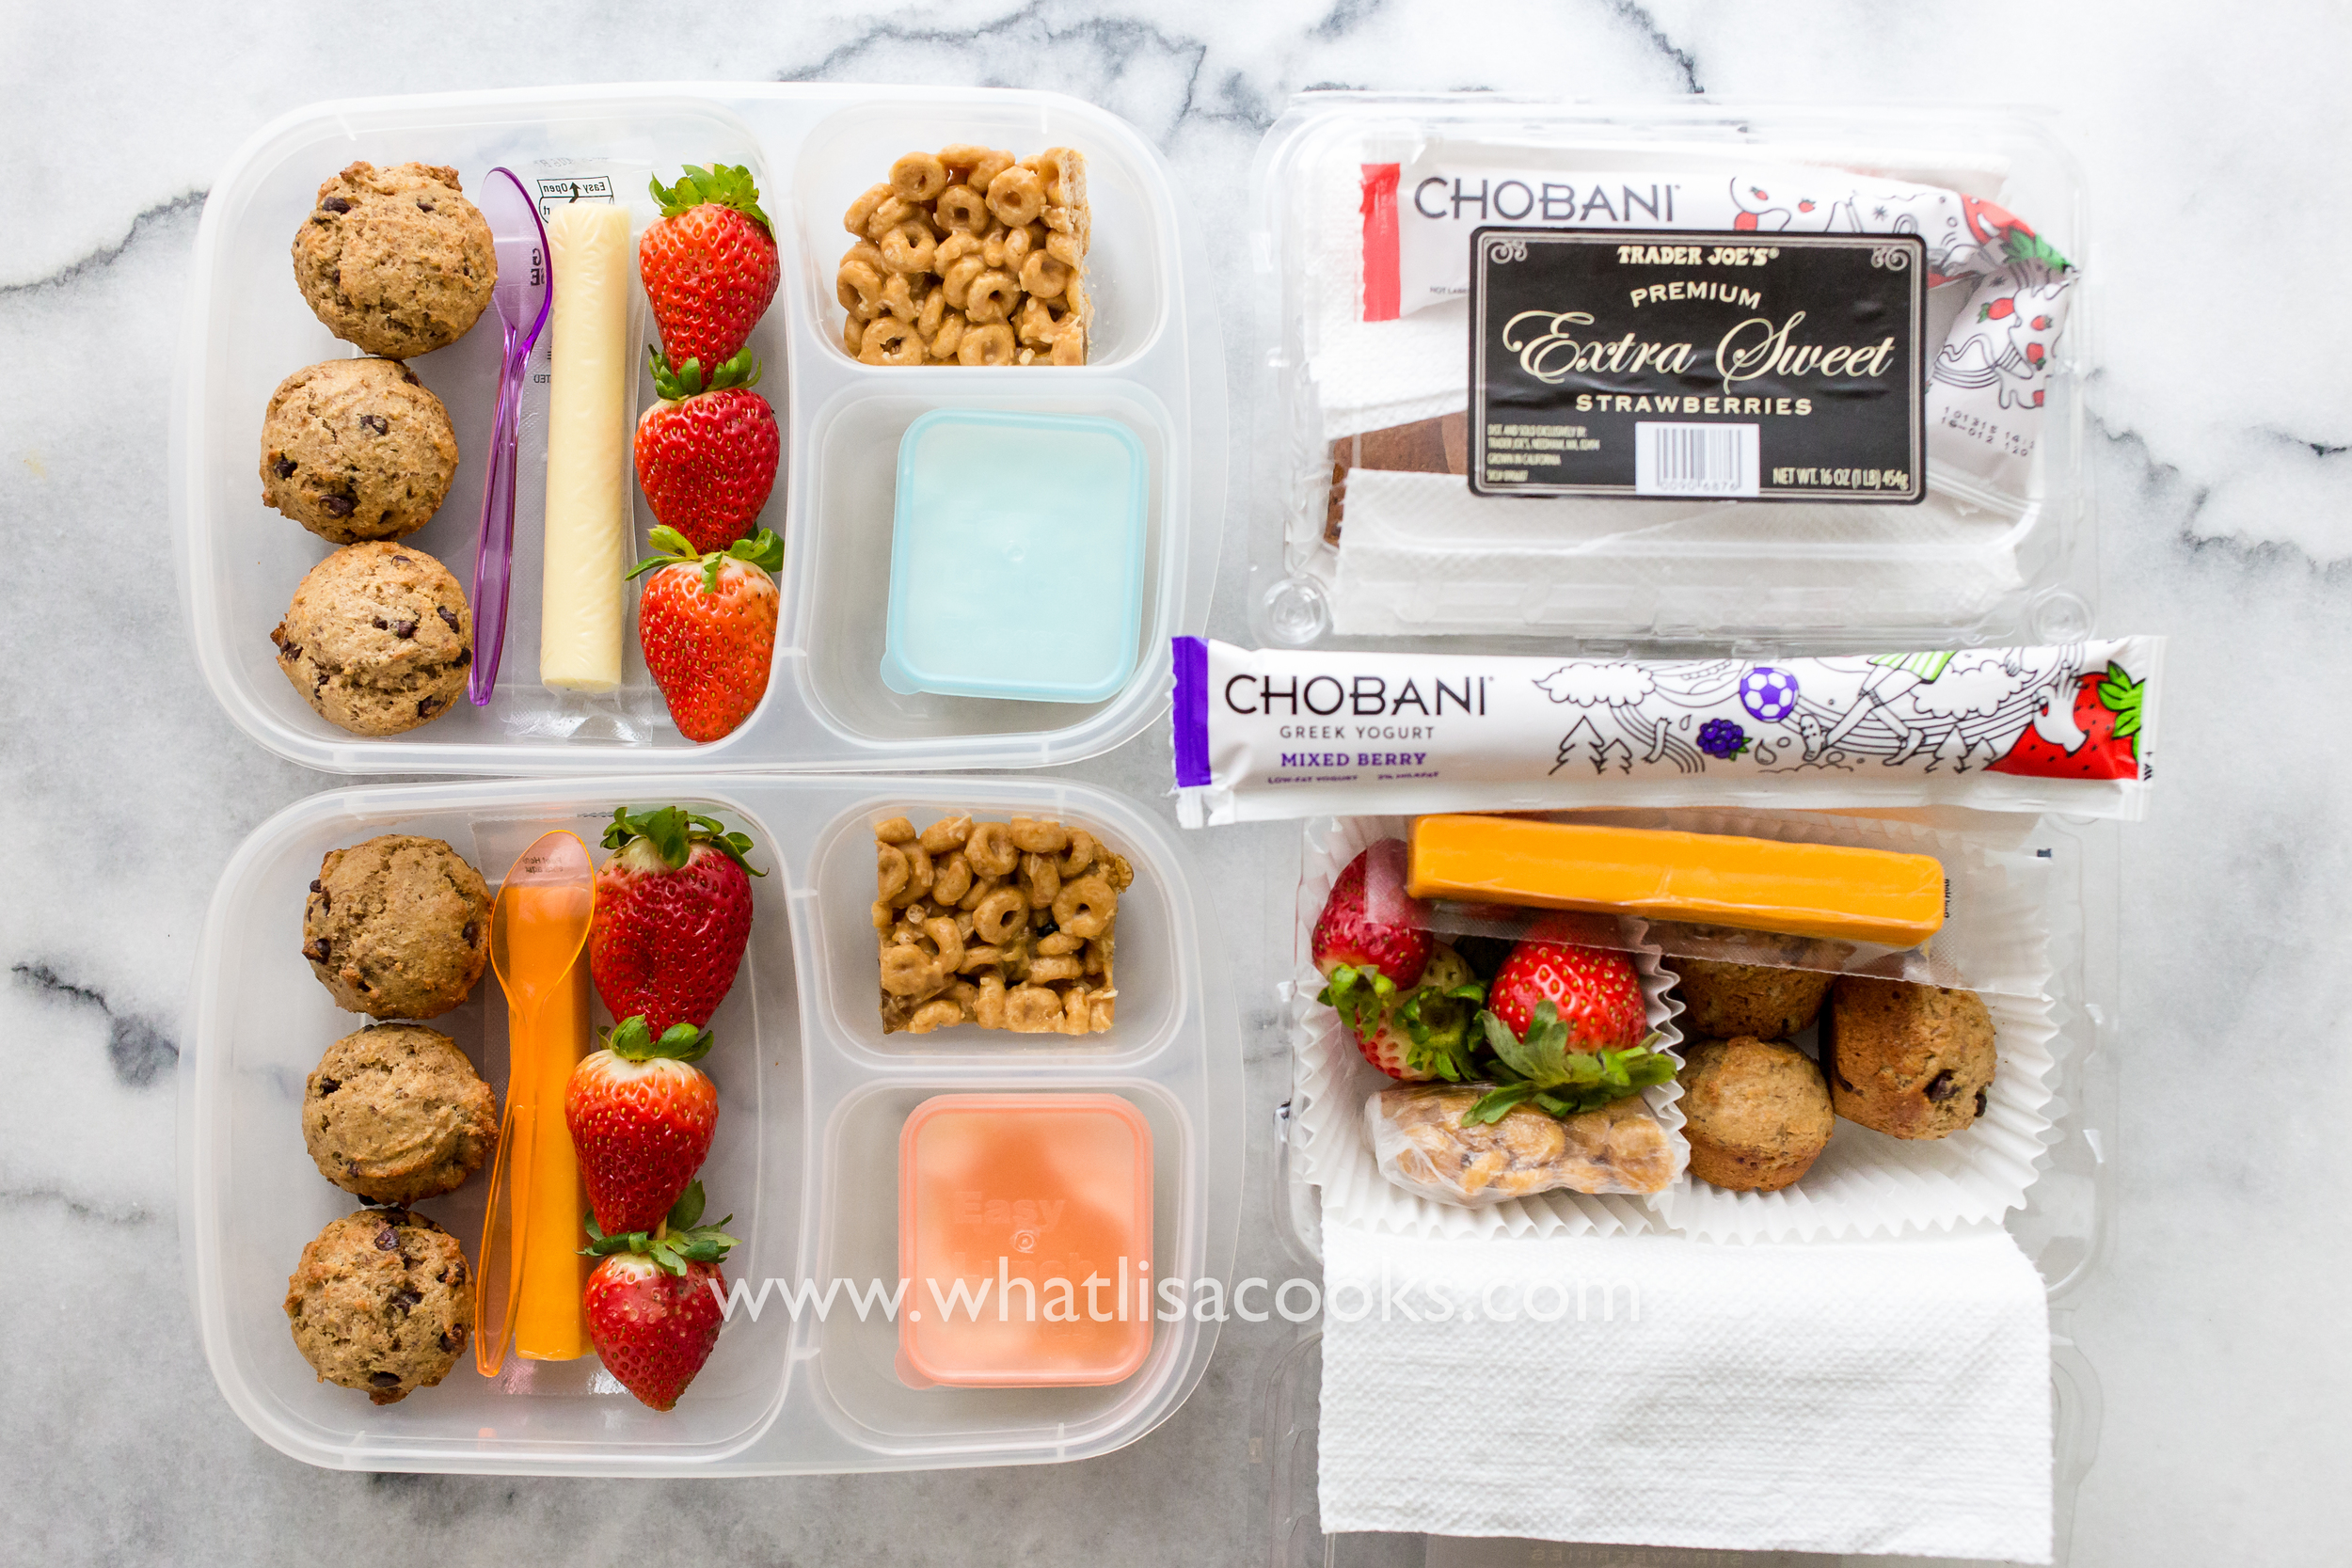 School Lunch Day 69: Muffins & Yogurt